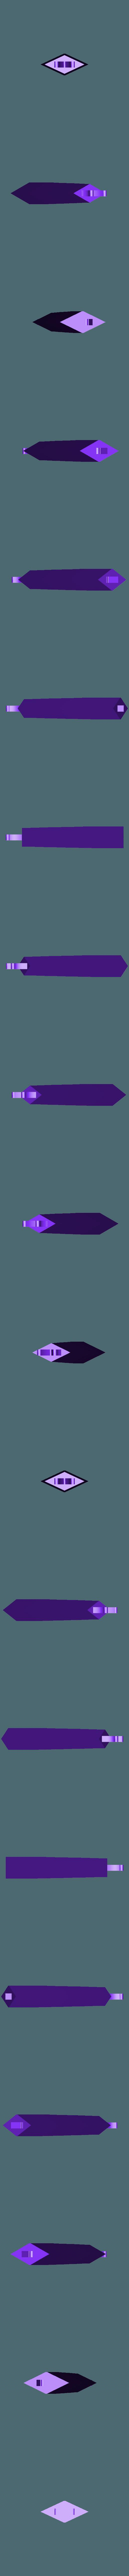 Updated Part 2 vendetta blade mid.stl Download free STL file V for Vendetta Dagger New and Improved • 3D printer model, stensethjeremy